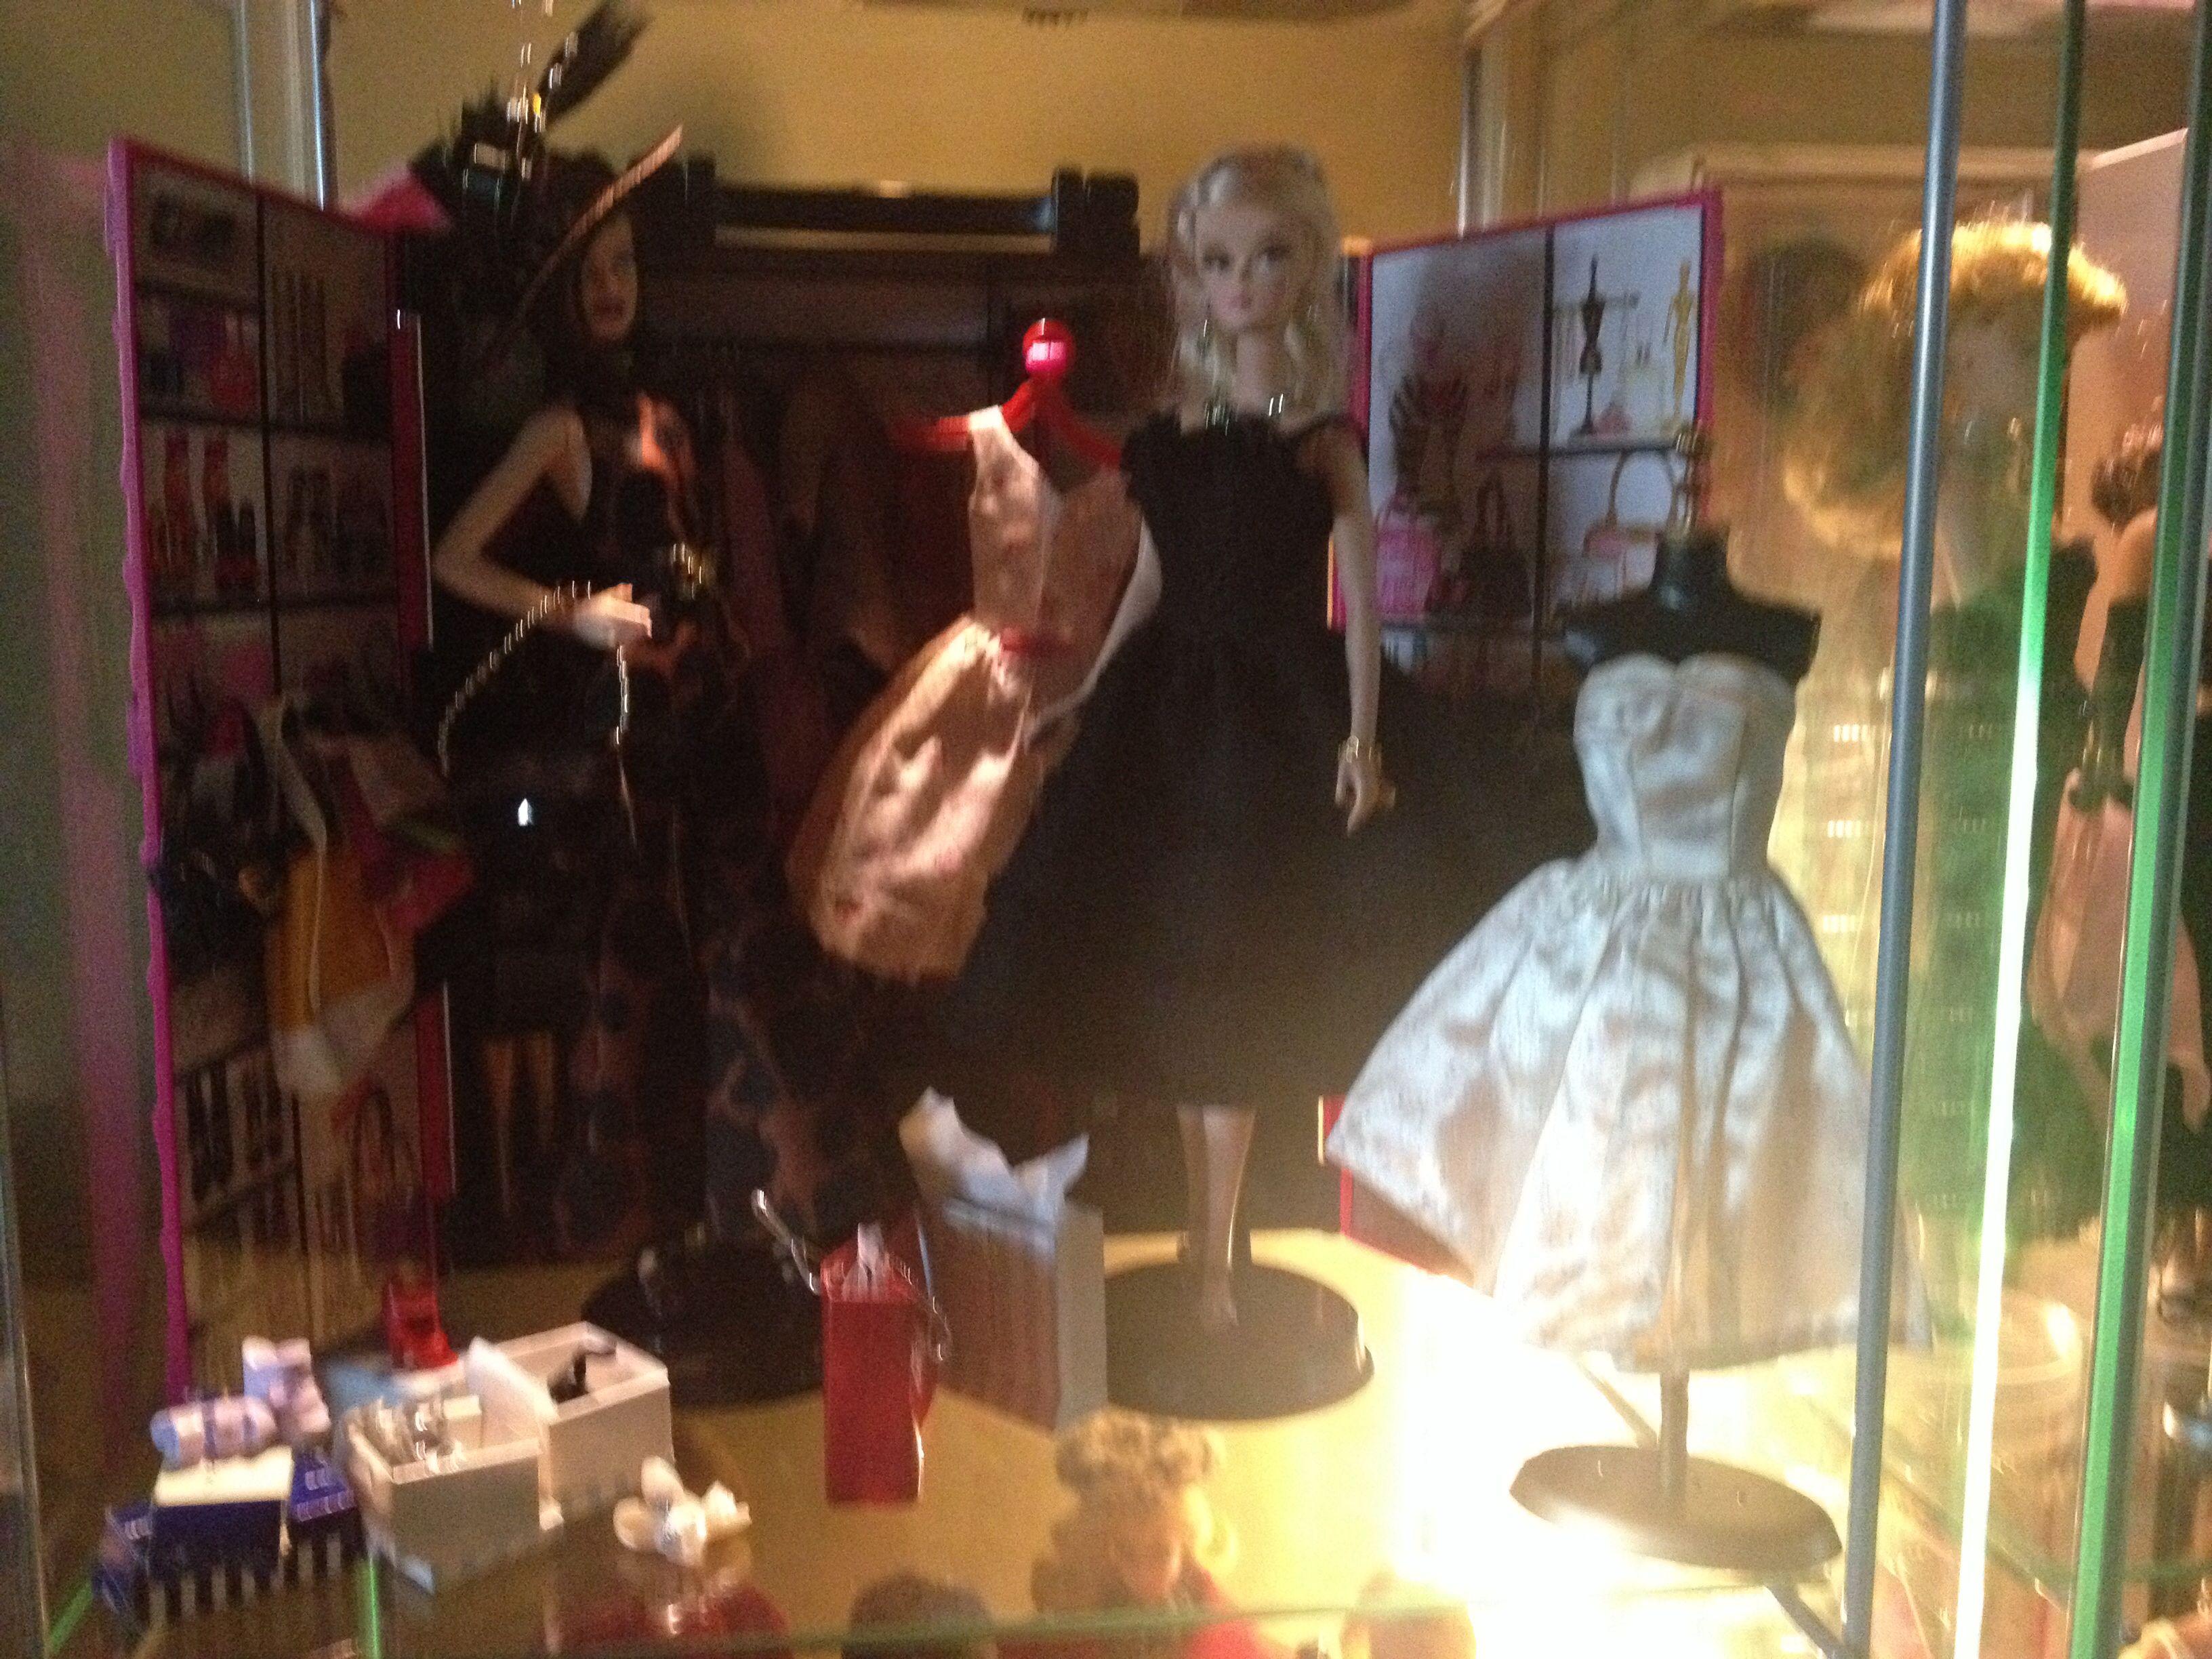 Barbies in shopping spree diorama.